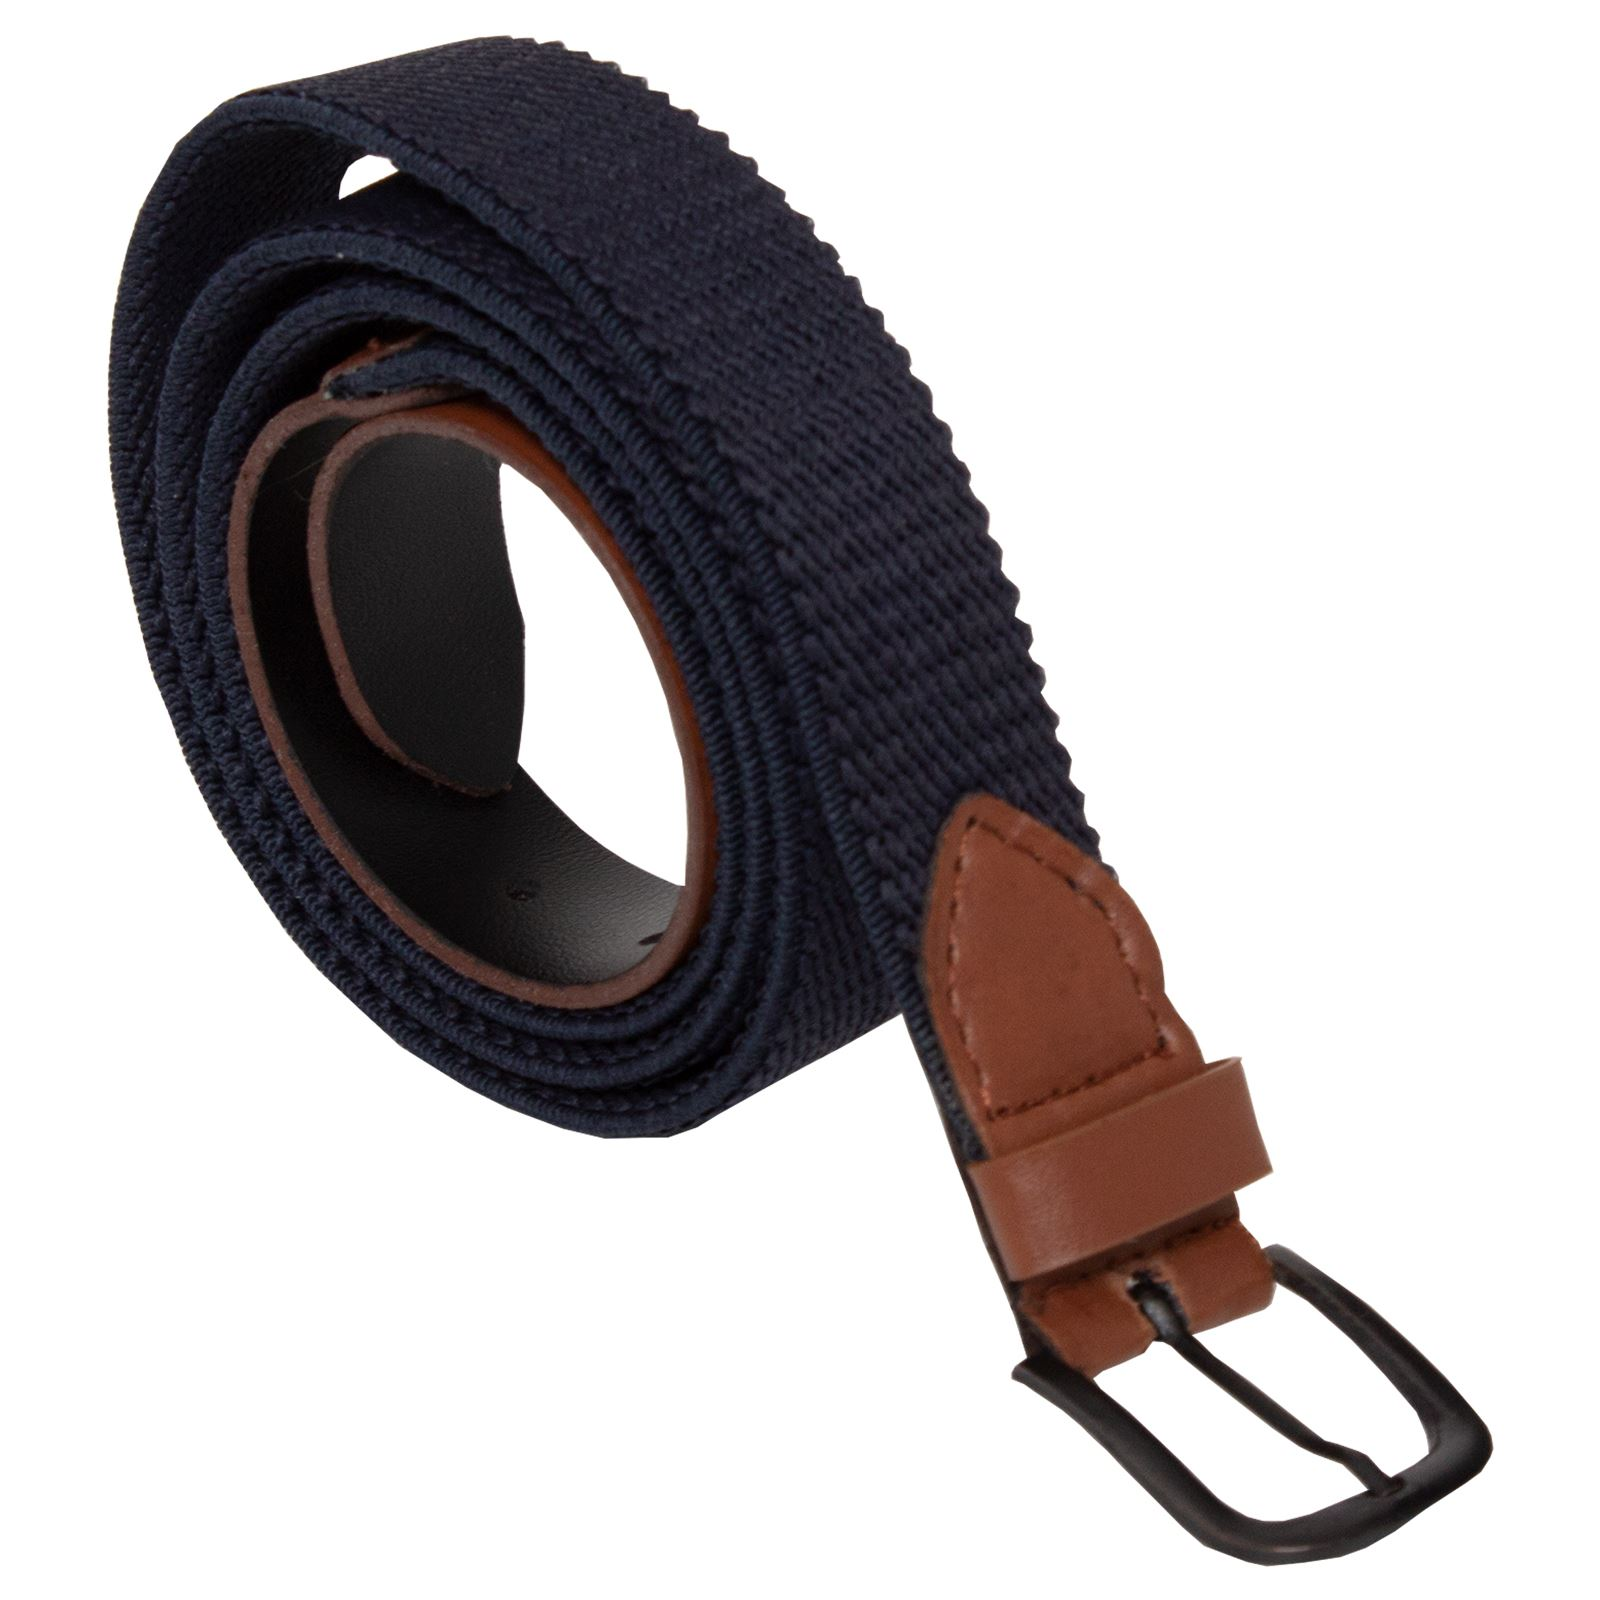 Mens-Ladies-Elasticated-Webbing-Belts-PU-Leather-Trim-Stretch-Canvas-Buckle-Belt Indexbild 4